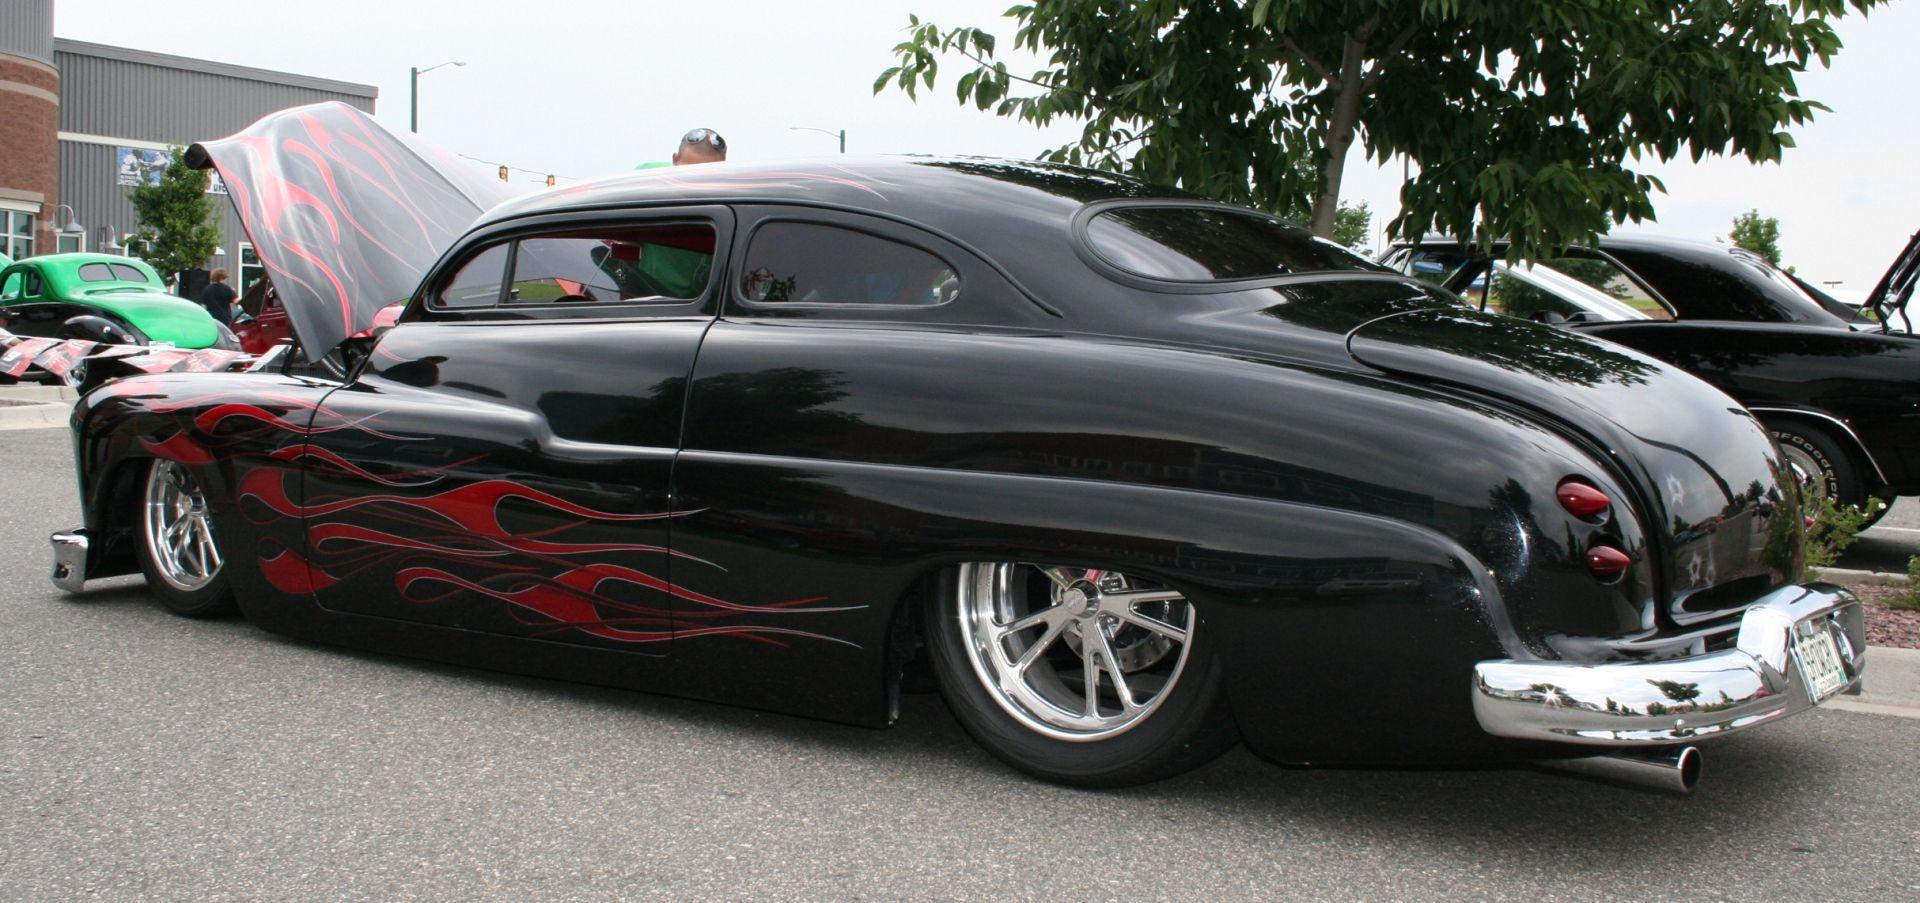 Used Car Values: Mercury Lead Sled (black with flames) | mercury 49 ...